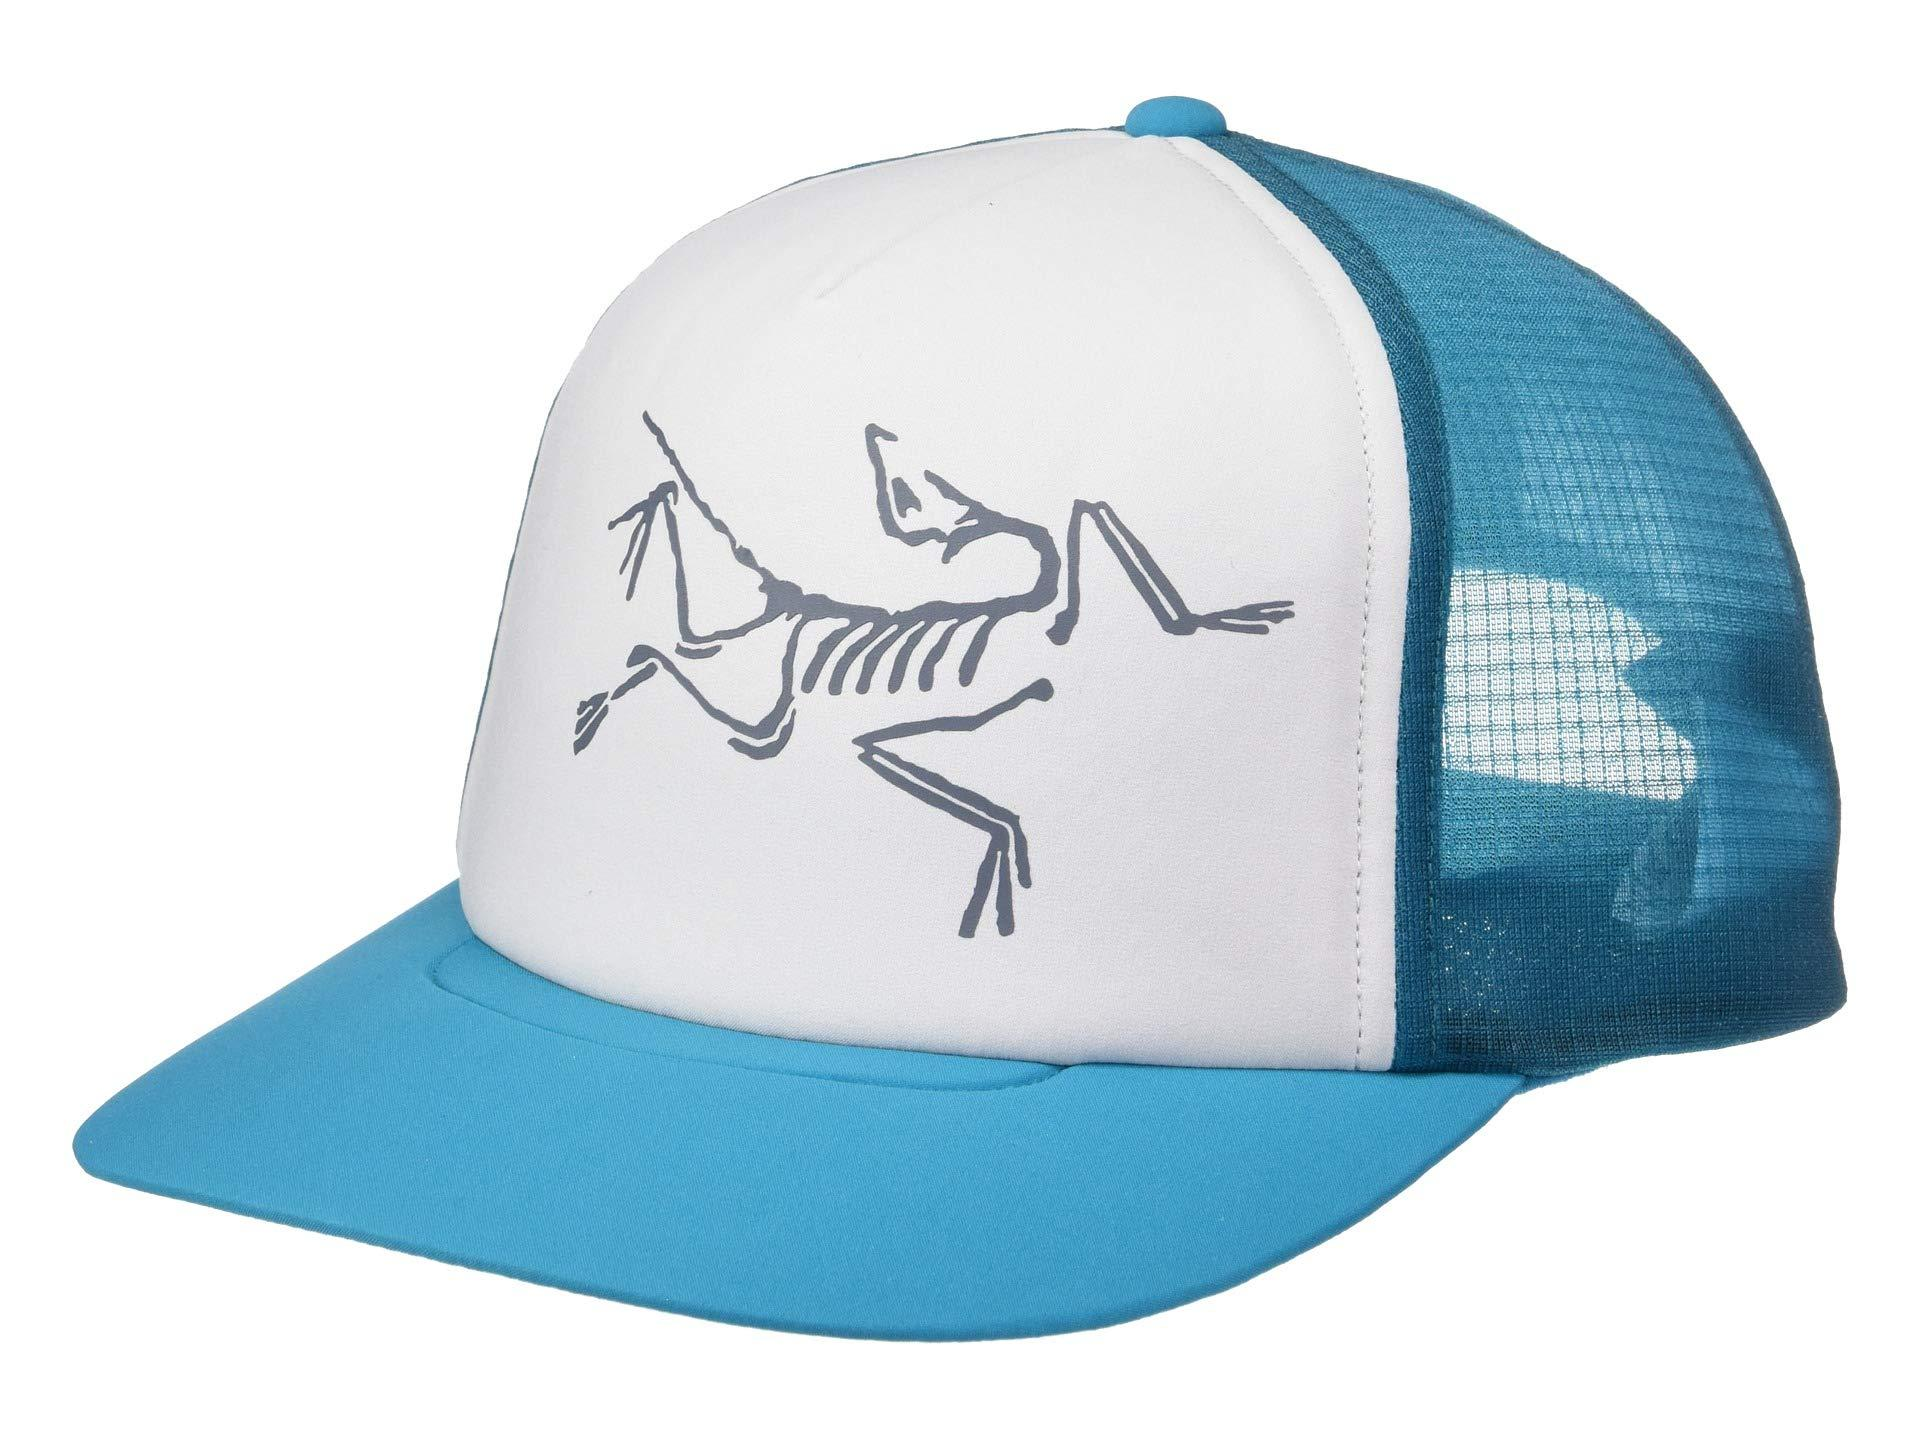 Lyst - Arc teryx Bird Trucker Hat (black) Caps in Blue for Men f73c49cd568a